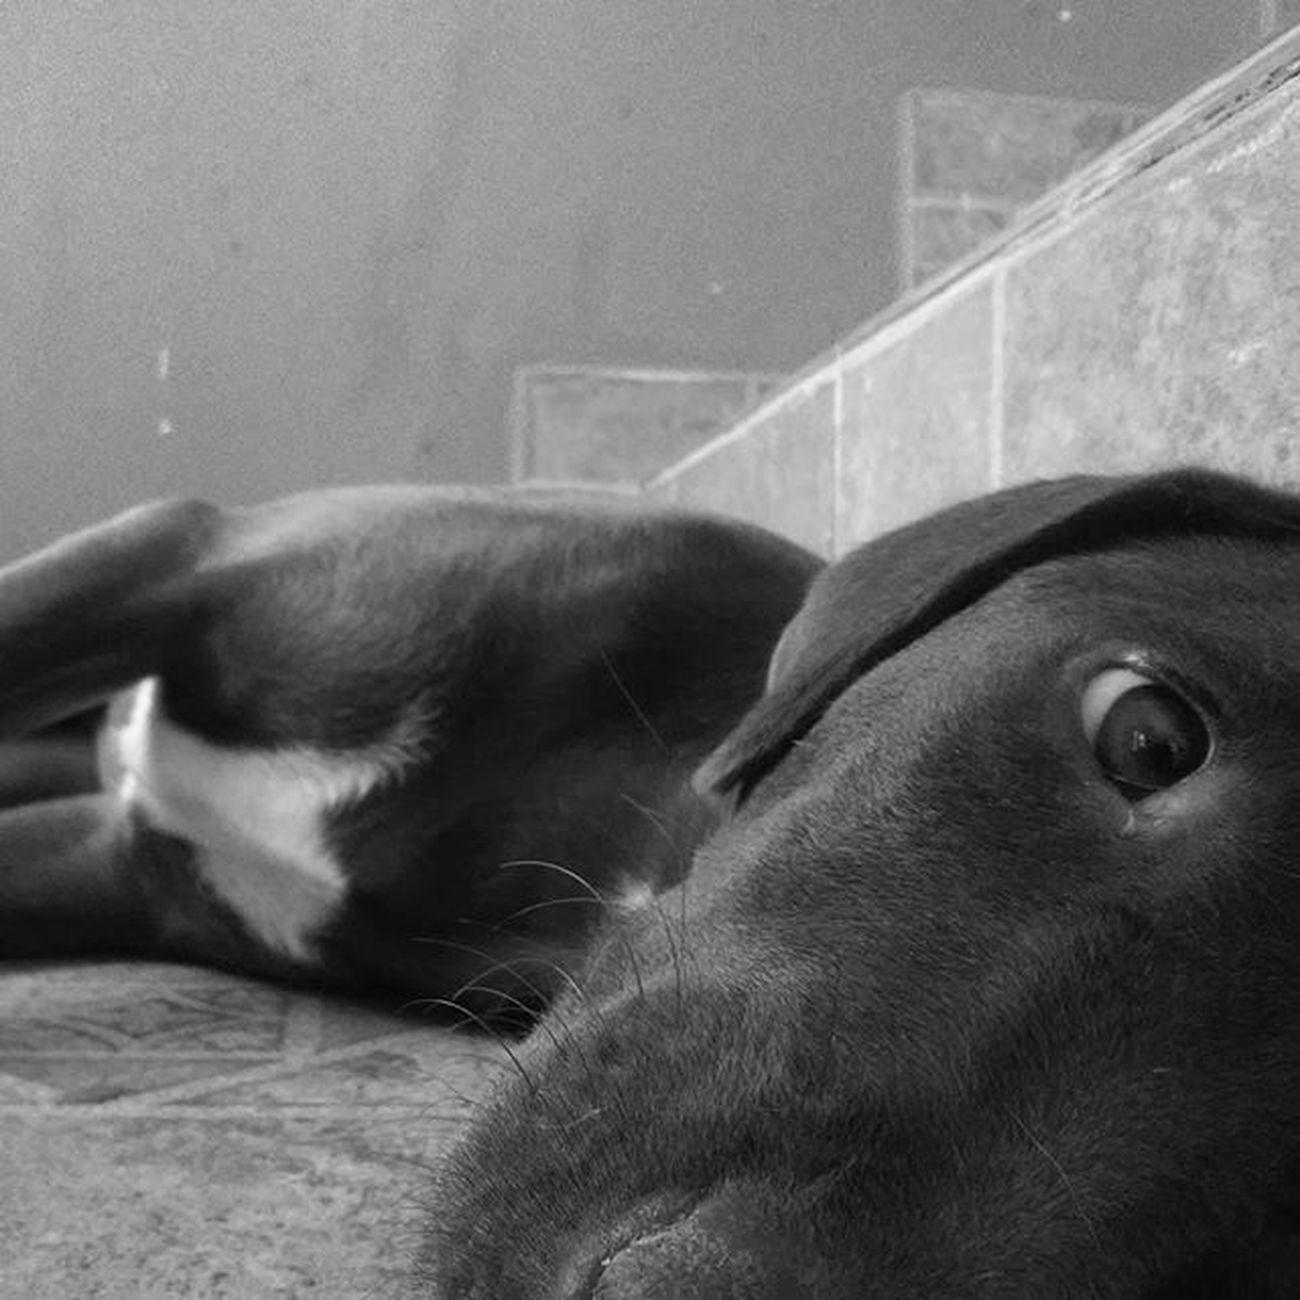 Oooi :3 vamos brincar ?? Android Androidography Androidcommunity Androidcamera AndroidCam Photographer Phography Photoshoot Photooftheday Colors Achadosdasemana Newinstagram Likeme Likesforfollow Followmeplease Follow4follow Followme Pet Adote DoeAmor Deamor Adotenaocompre Help Photographer Photooftheday photoshoot self makehappy behappy dog doginstagram